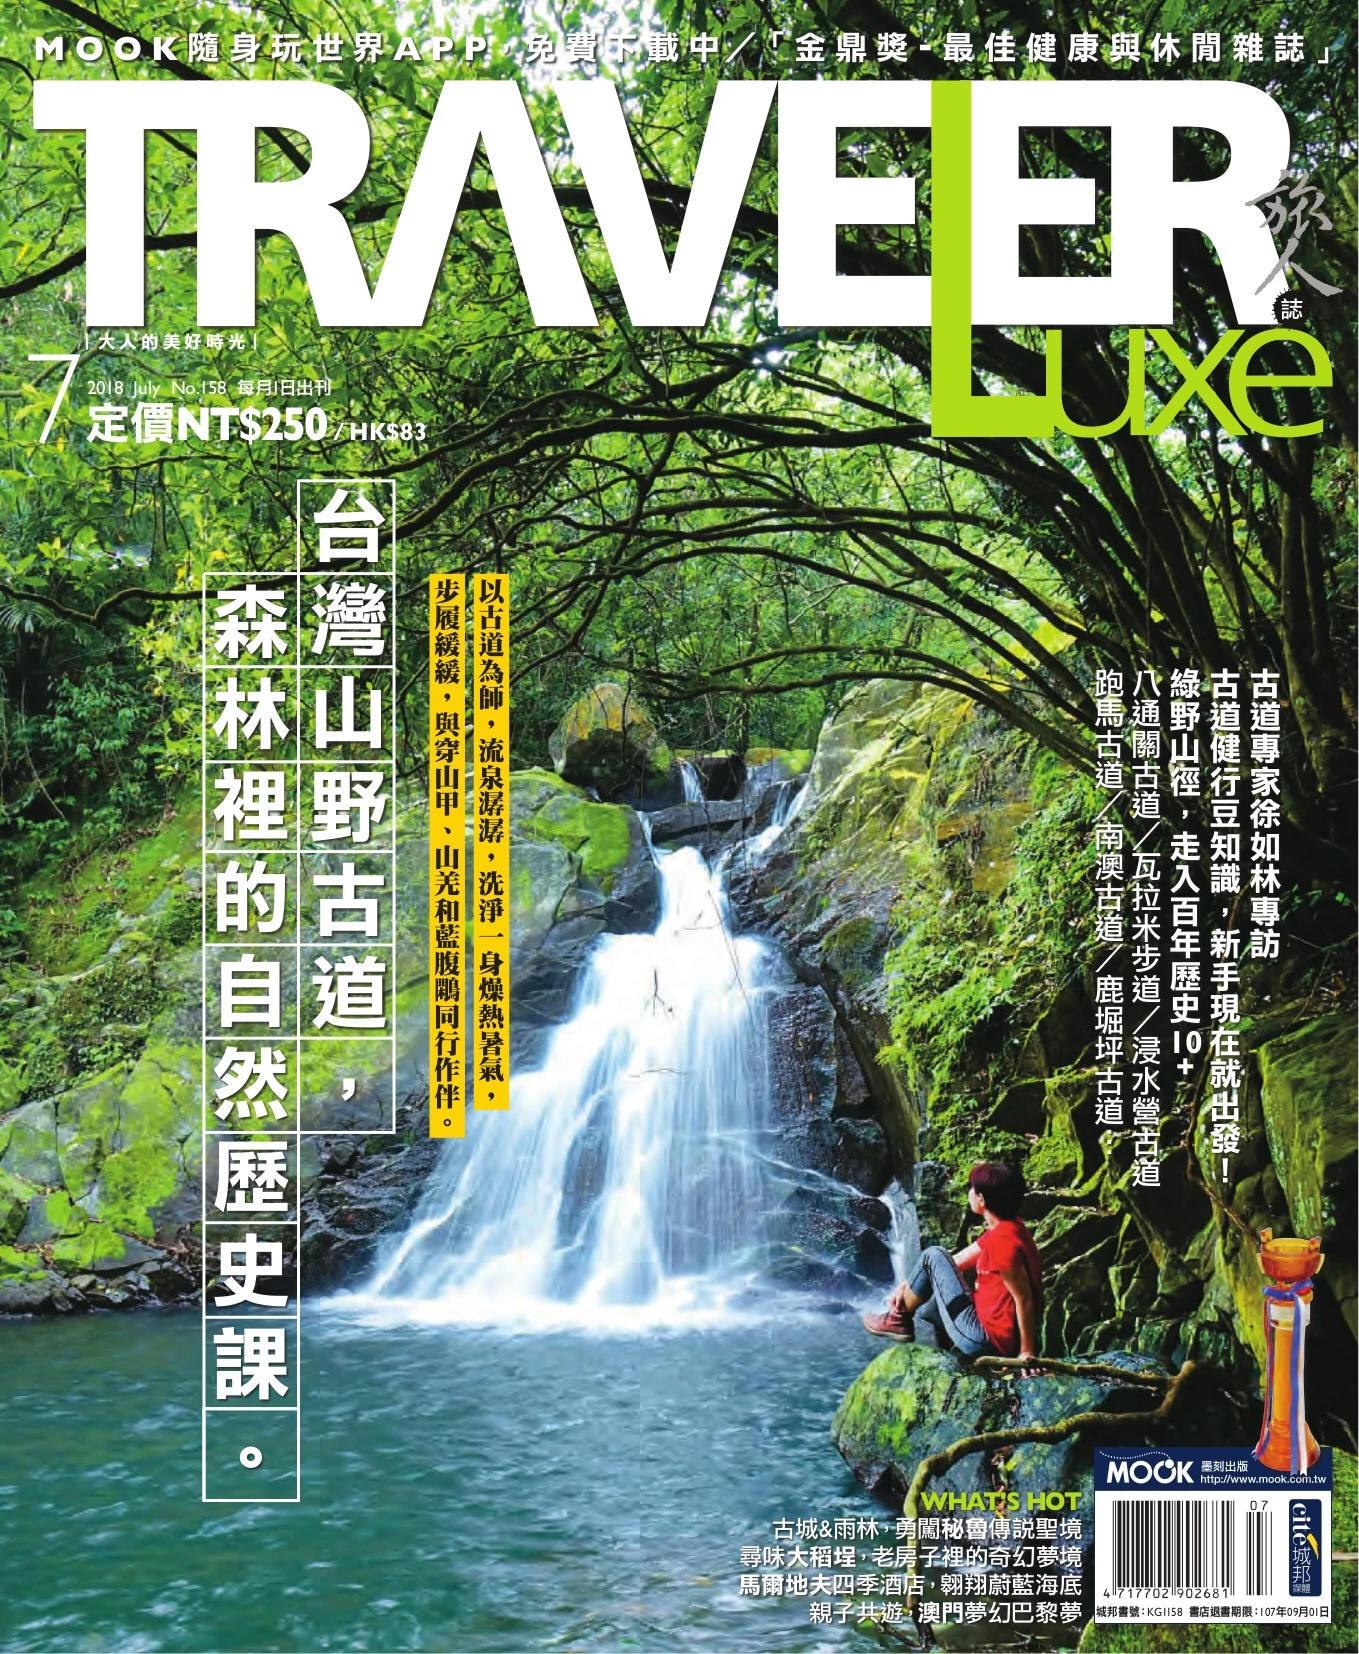 TRAVELER Luxe 旅人誌 158 (封面)